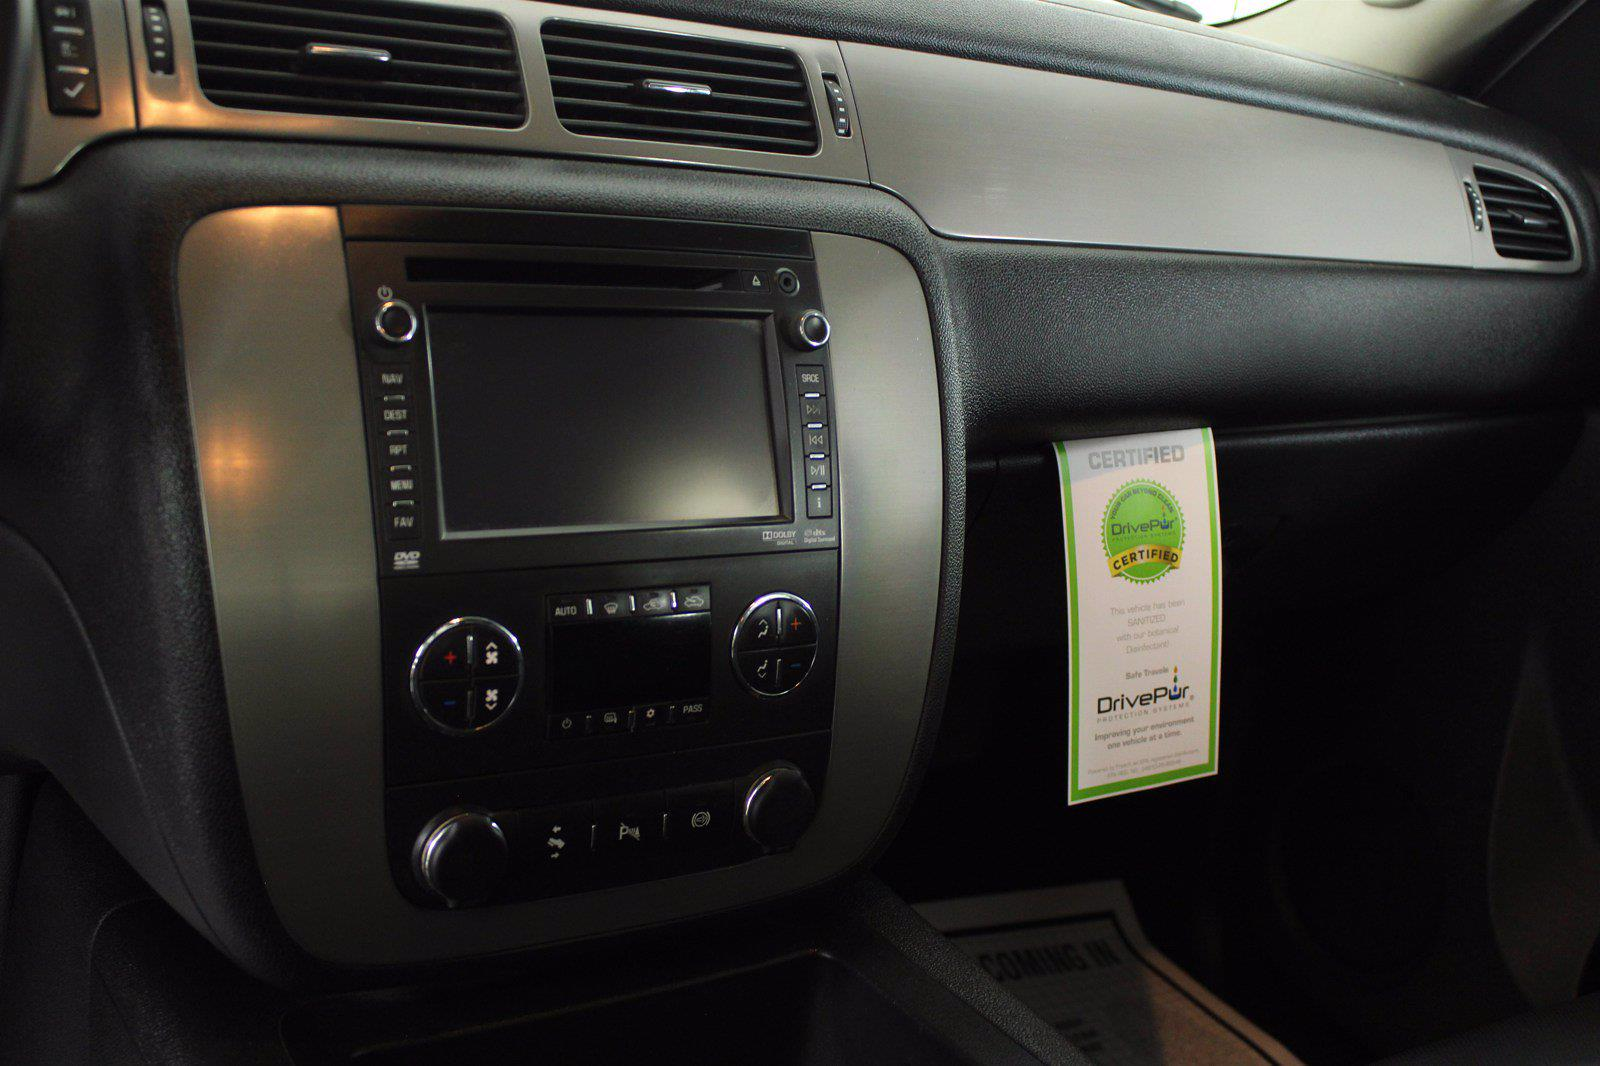 2014 Chevrolet Silverado 3500 Crew Cab 4x4, Pickup #D110865A - photo 3